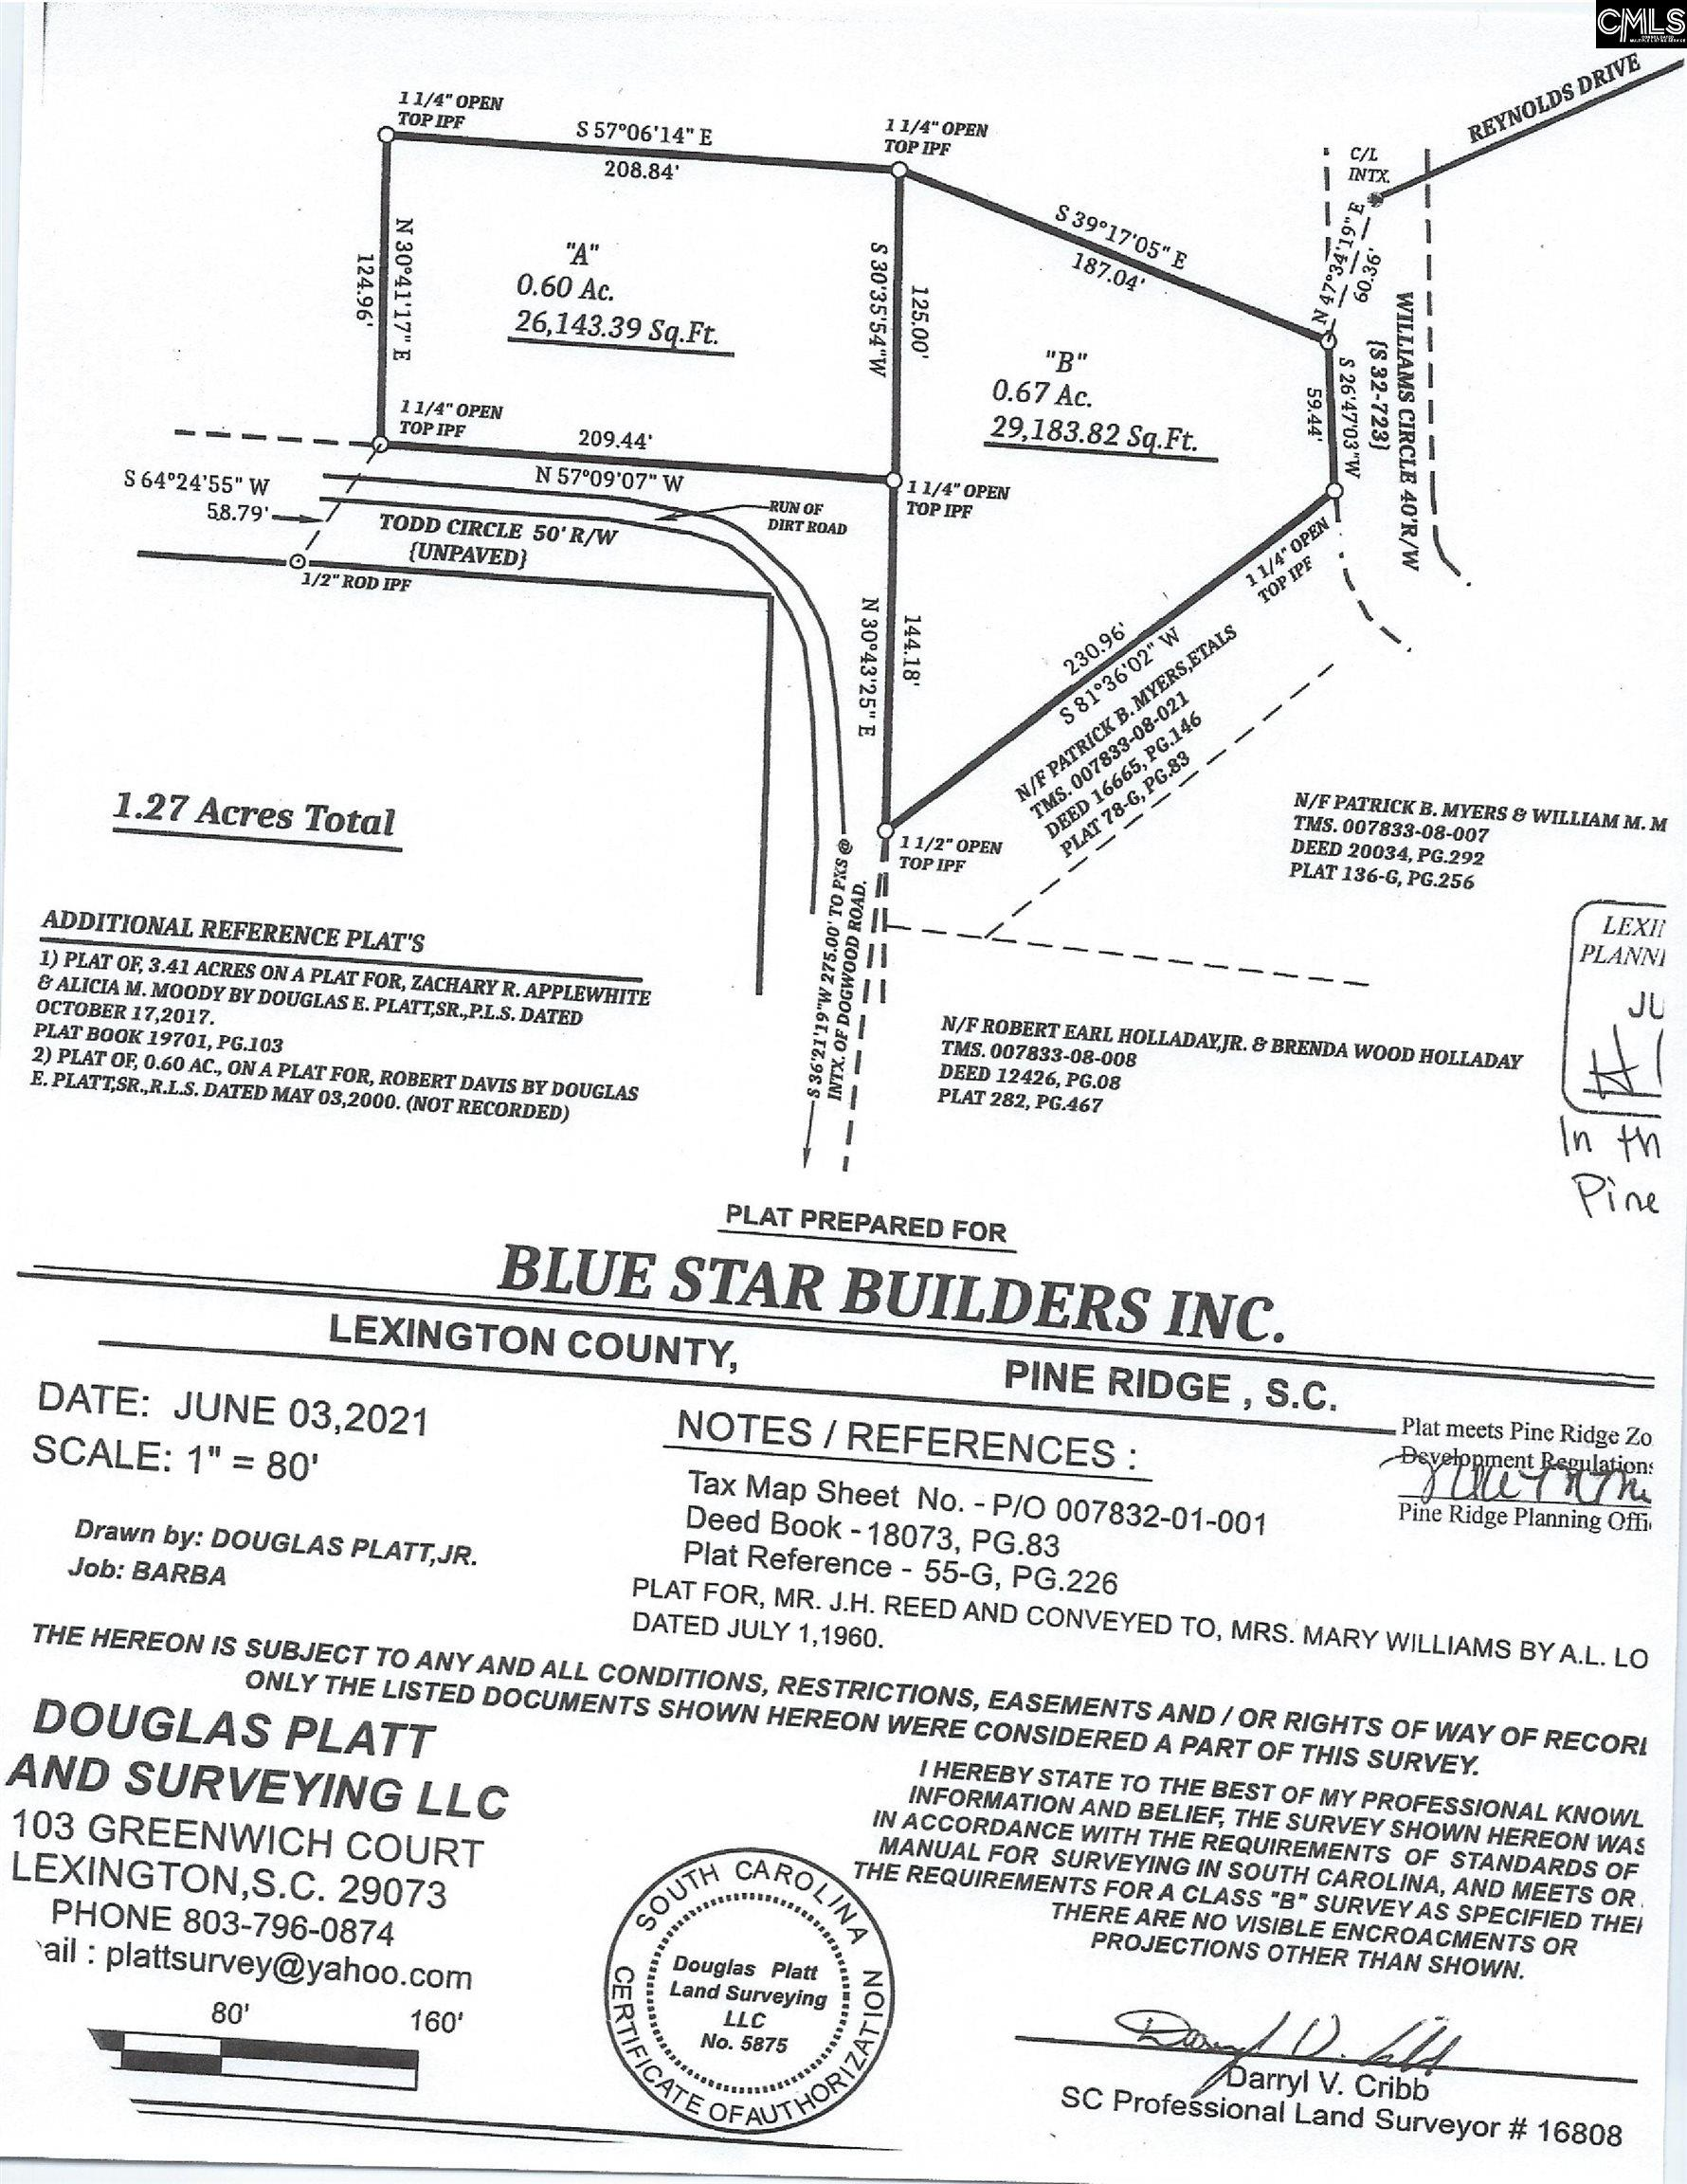 191 Todd Circle West Columbia, SC 29172